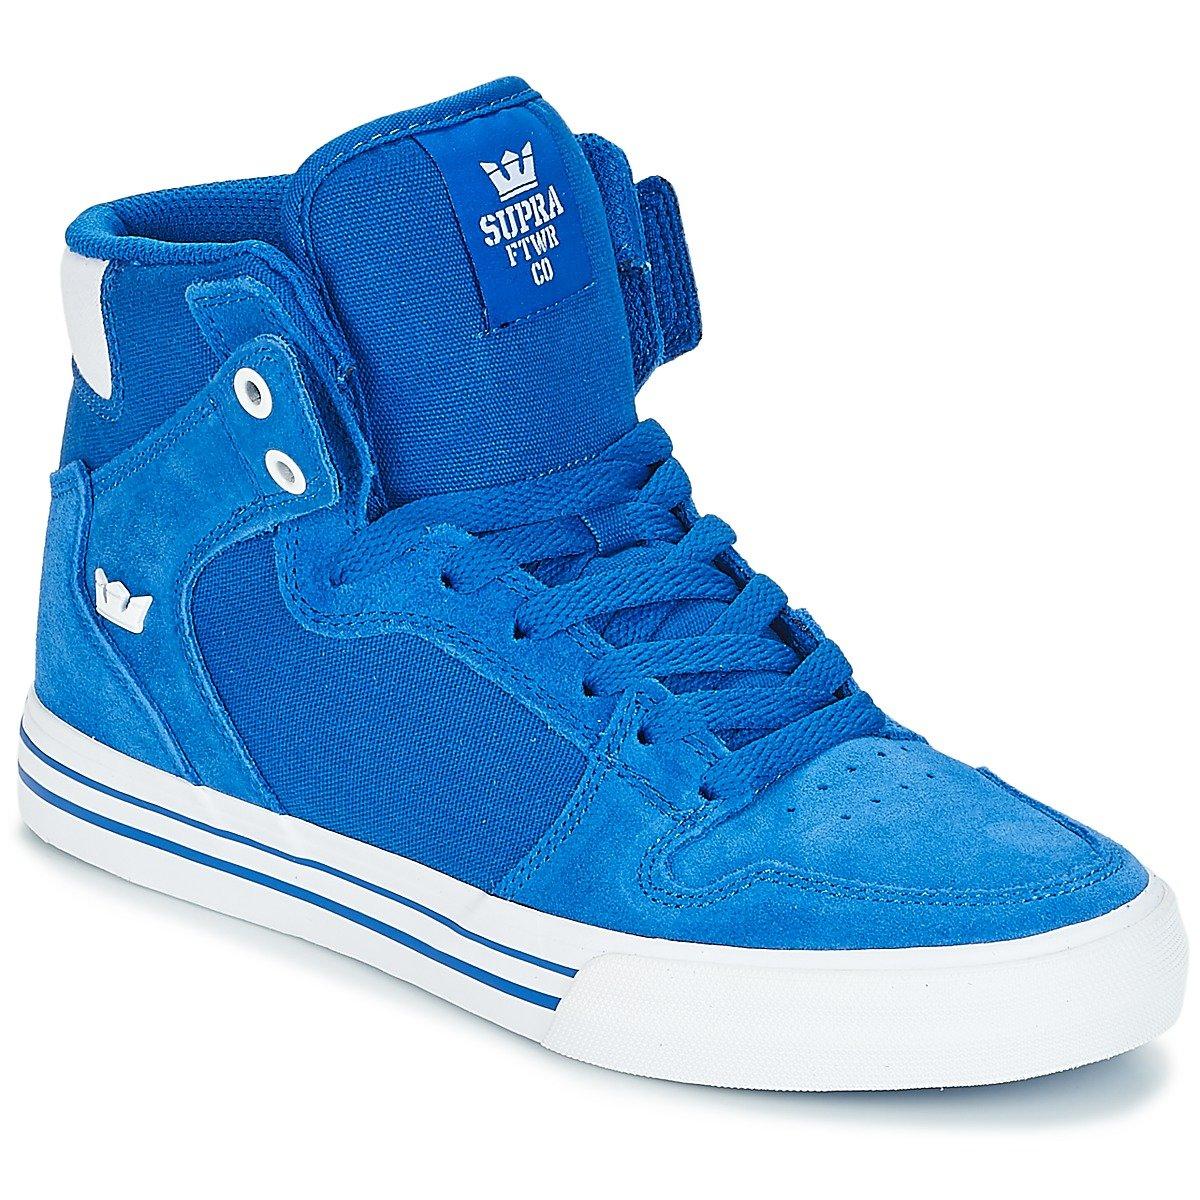 Supra Vaider LC Sneaker B074KMBB7K 11.5 Women / 10 Men M US|Ocean/White